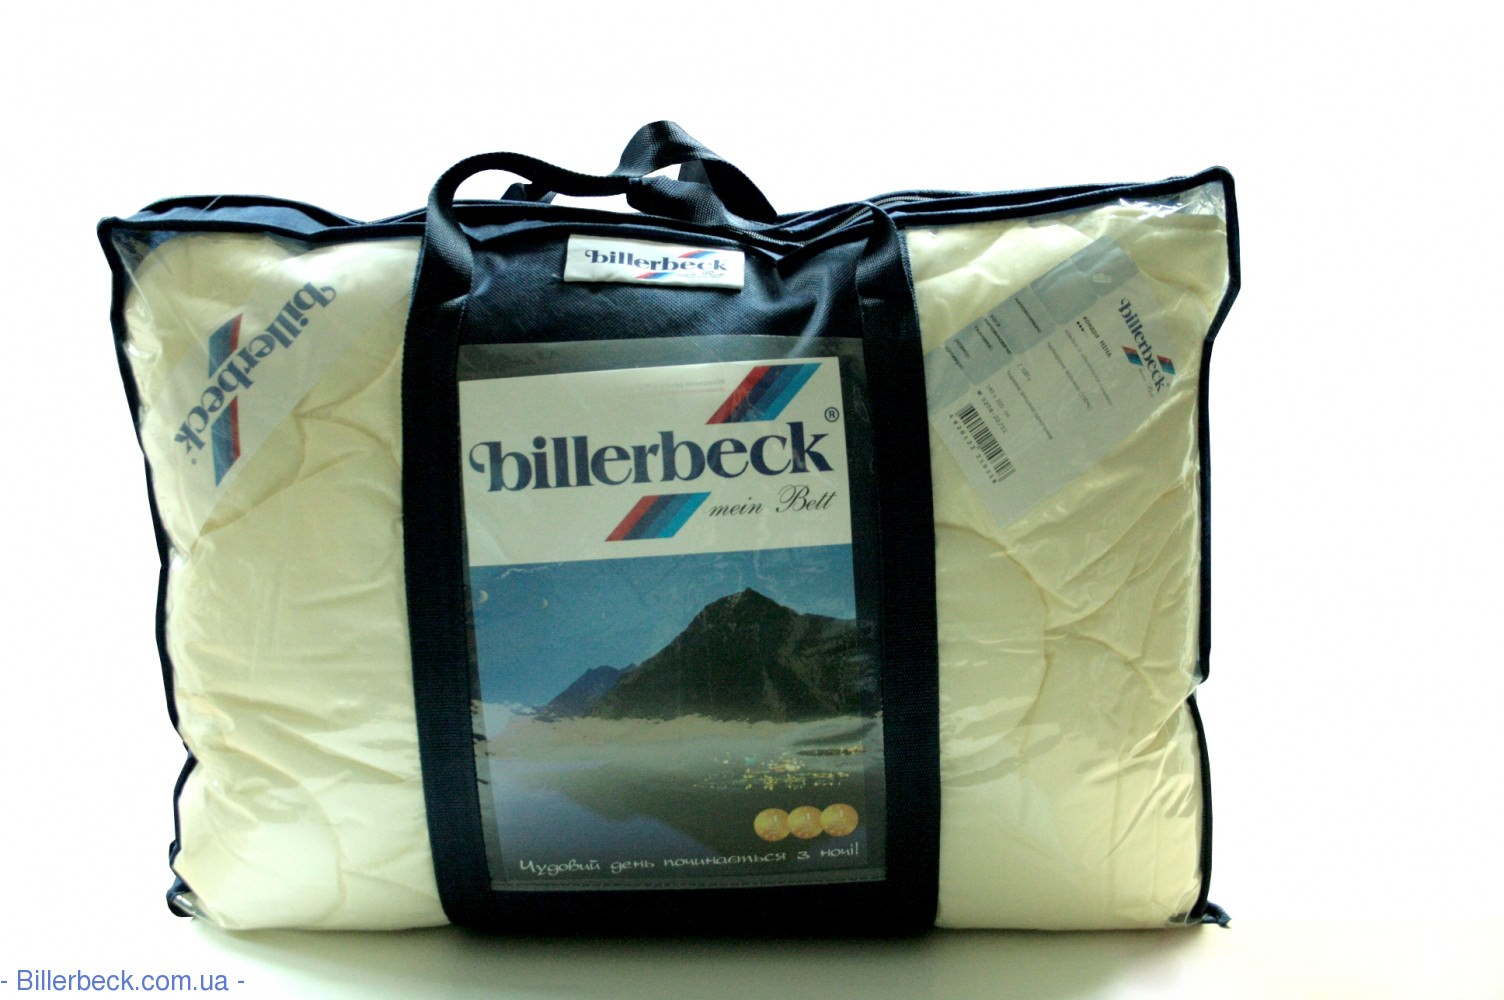 Одеяло Нина легкое Billerbeck - 2